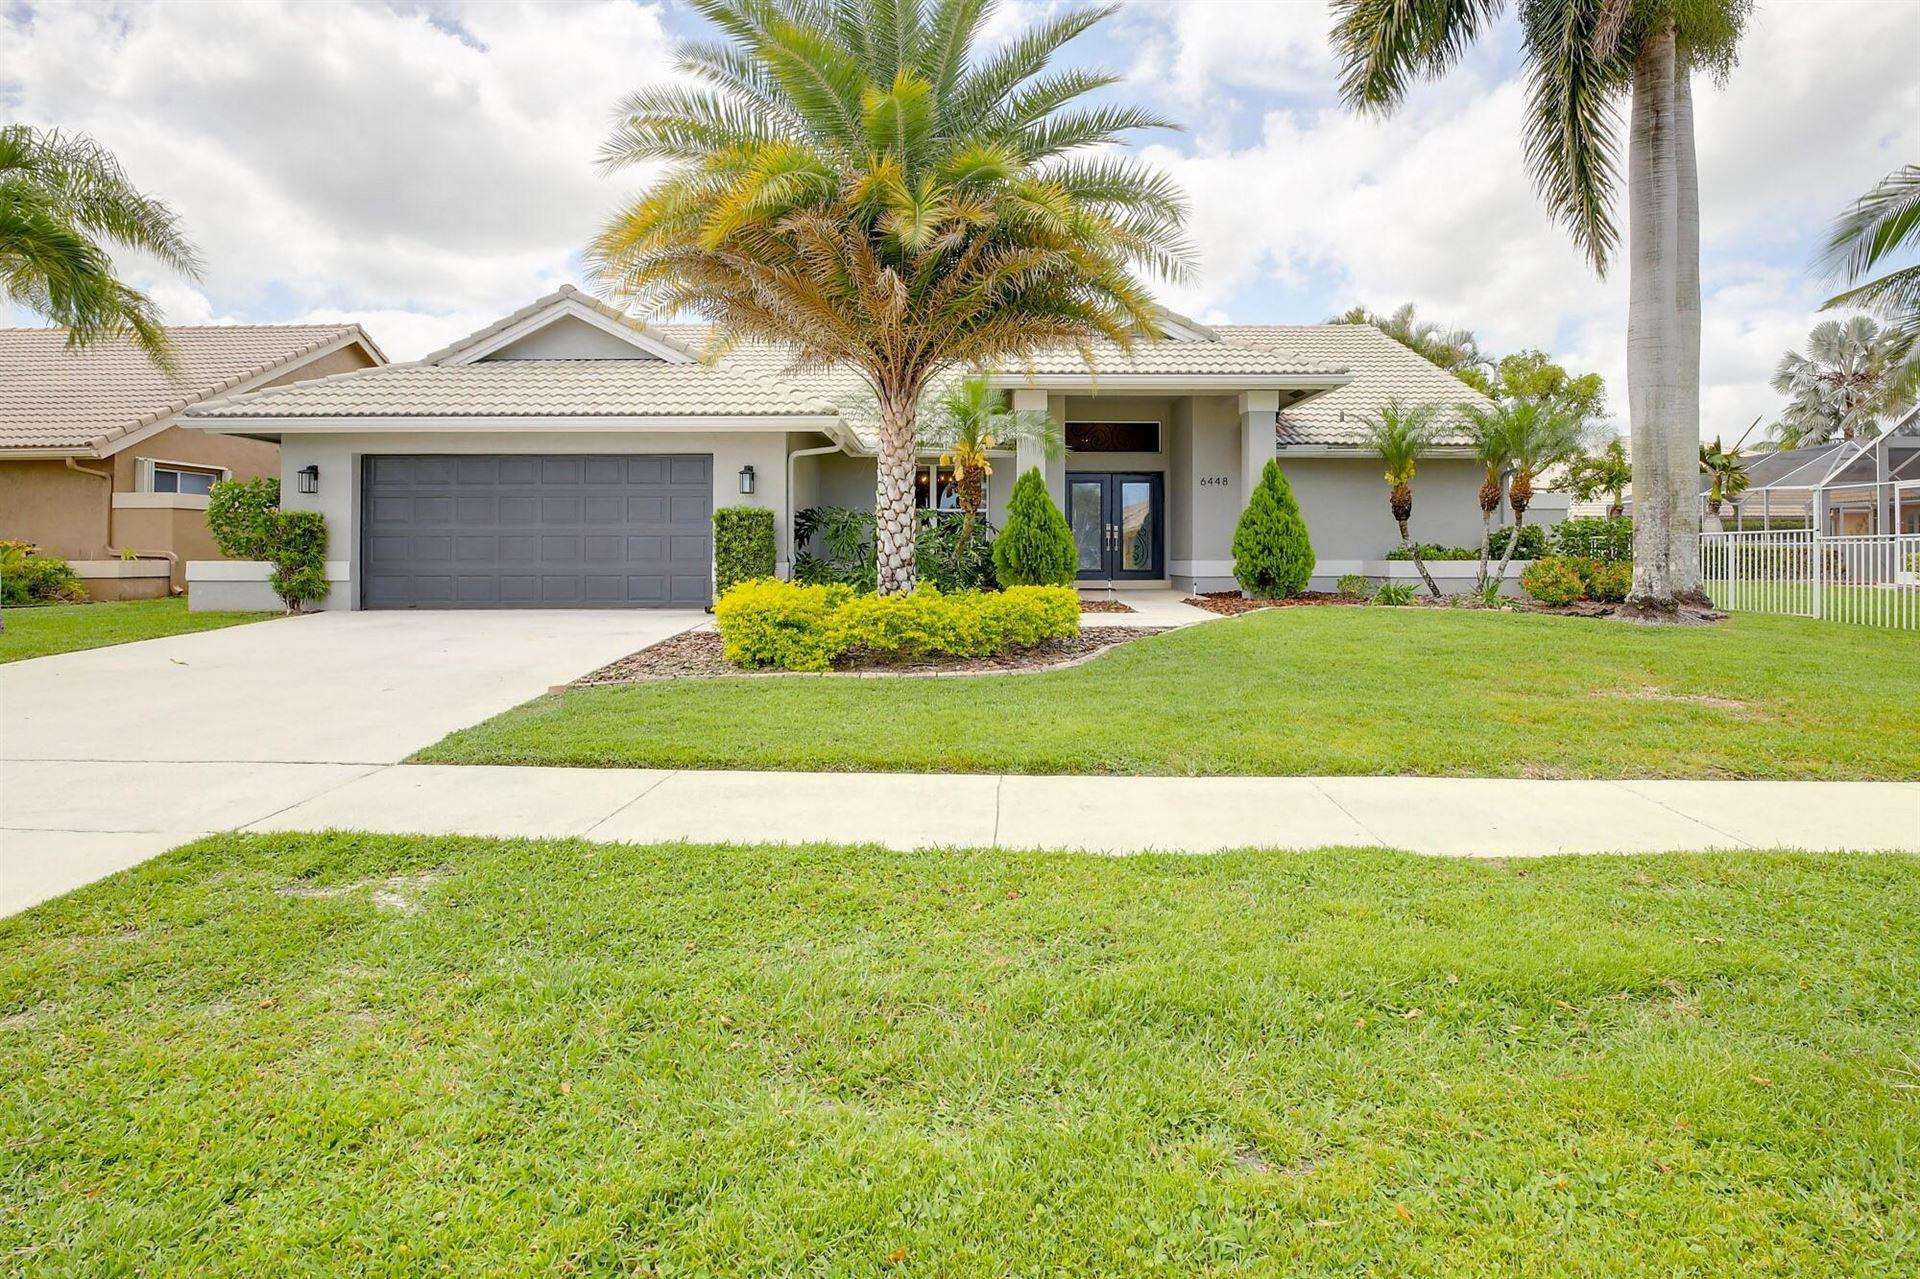 6448 Blue Bay Circle, Lake Worth, FL 33467 - MLS#: RX-10711904